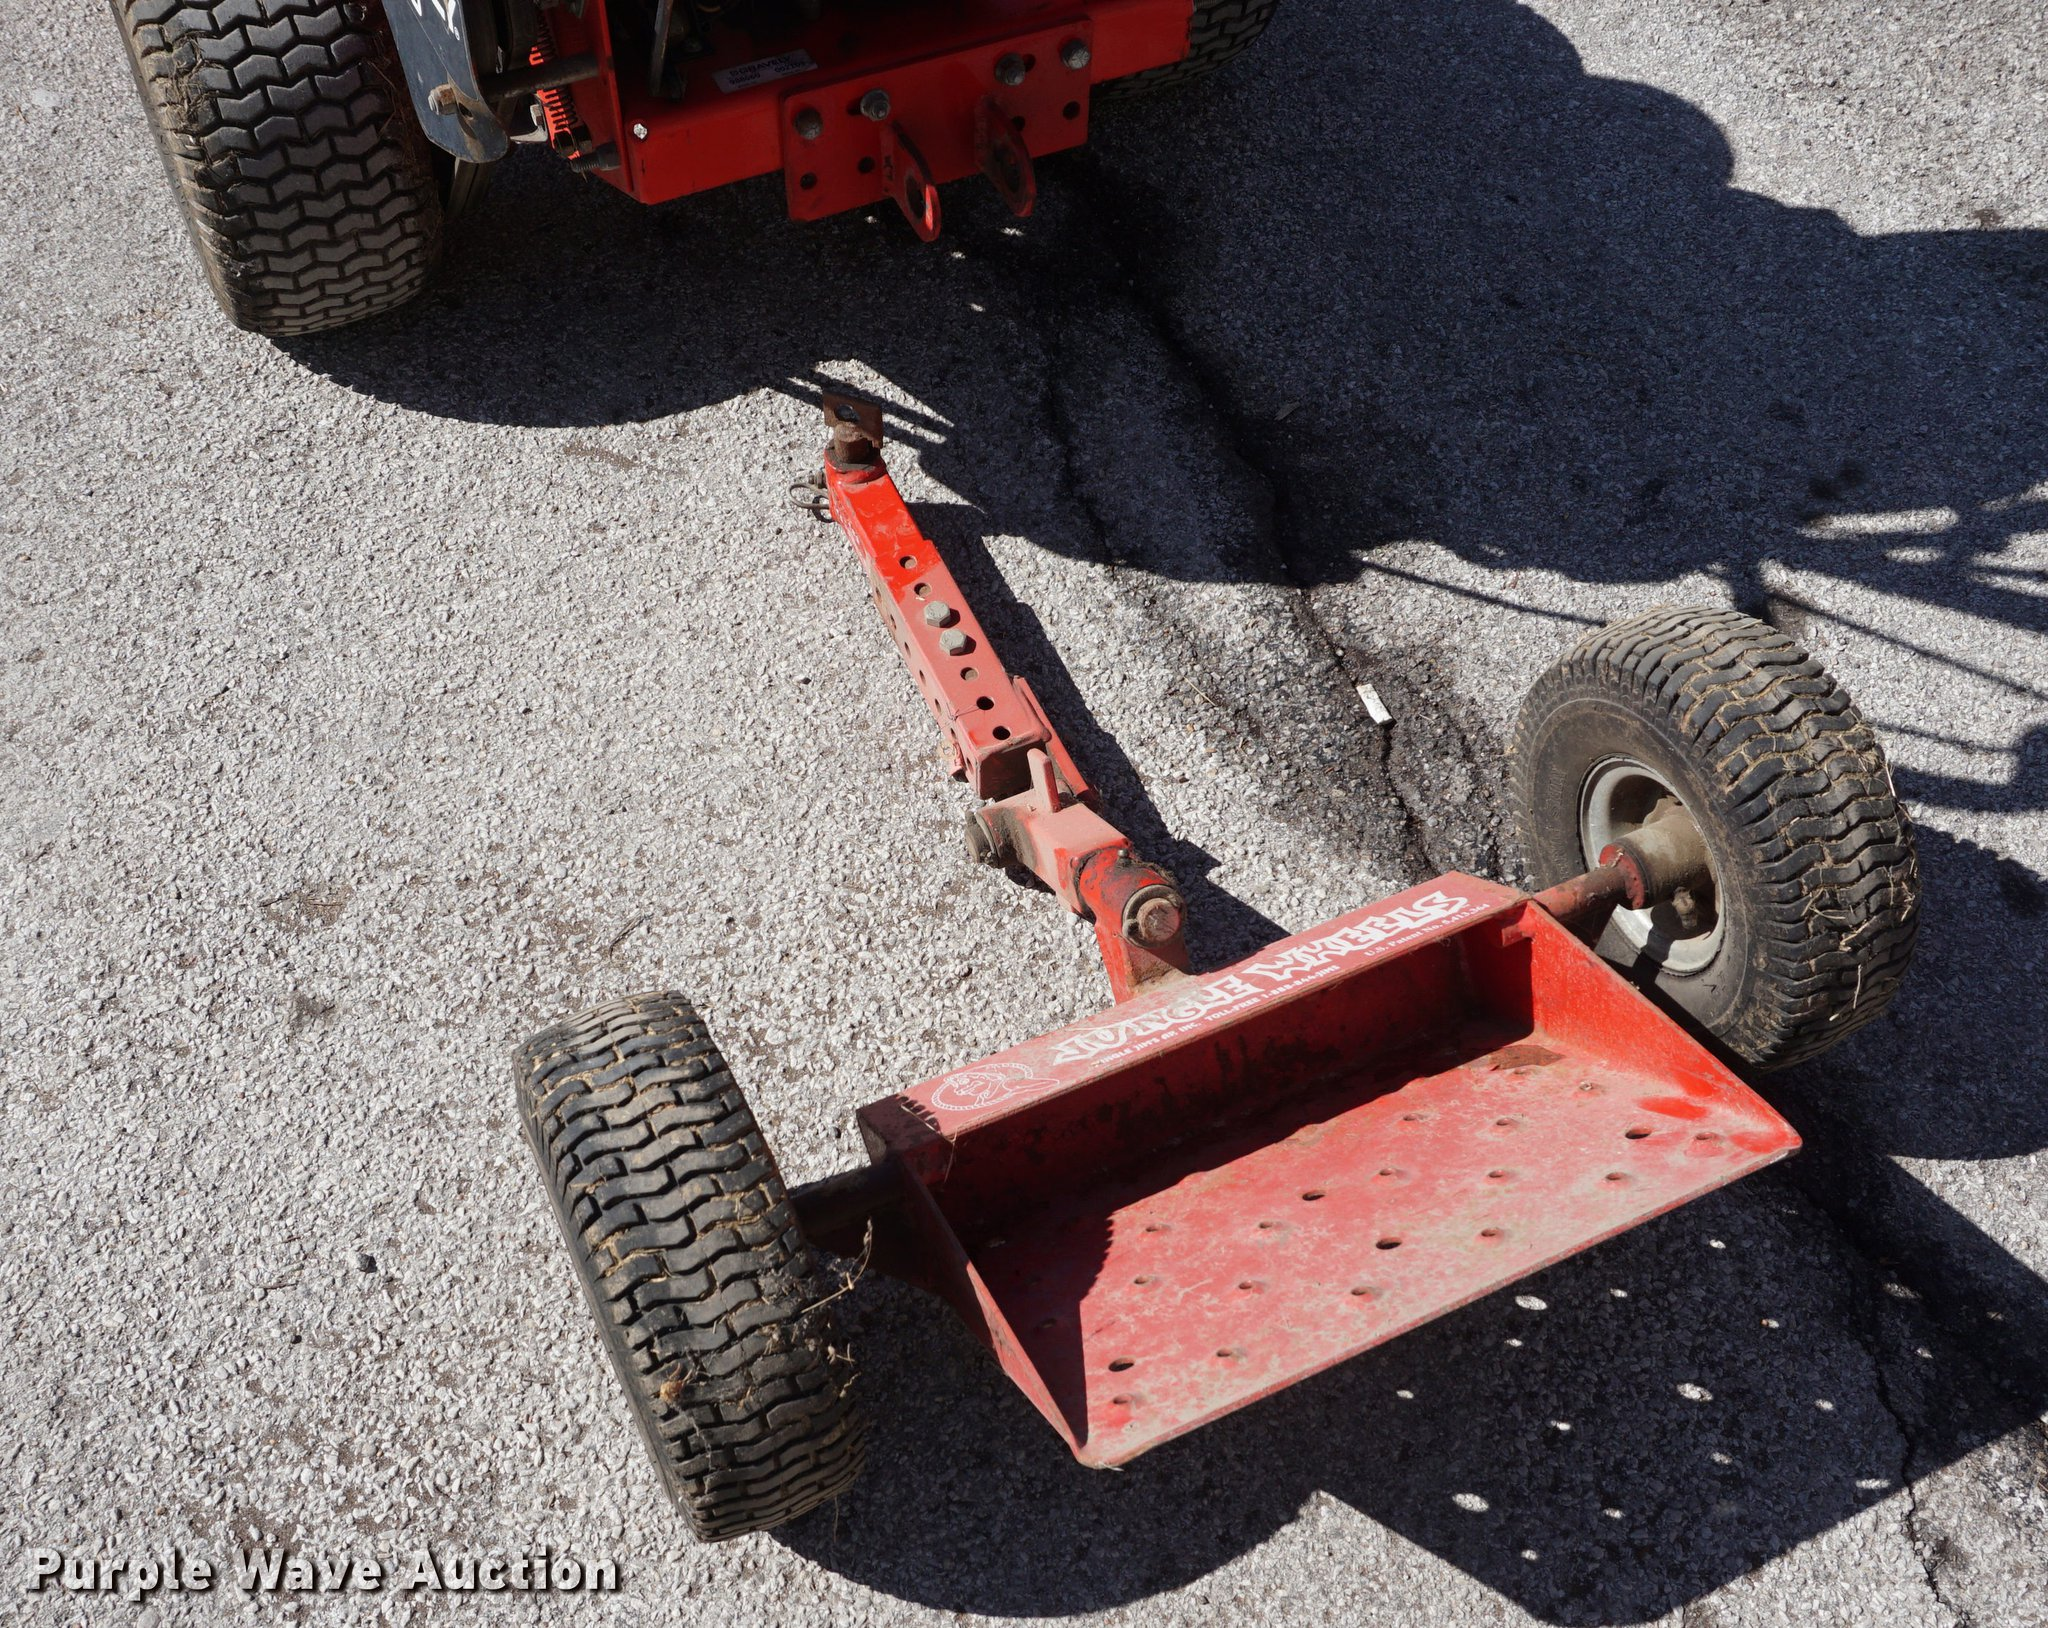 Gravely Pro 36 lawn mower | Item DB0474 | SOLD! March 20 Gov